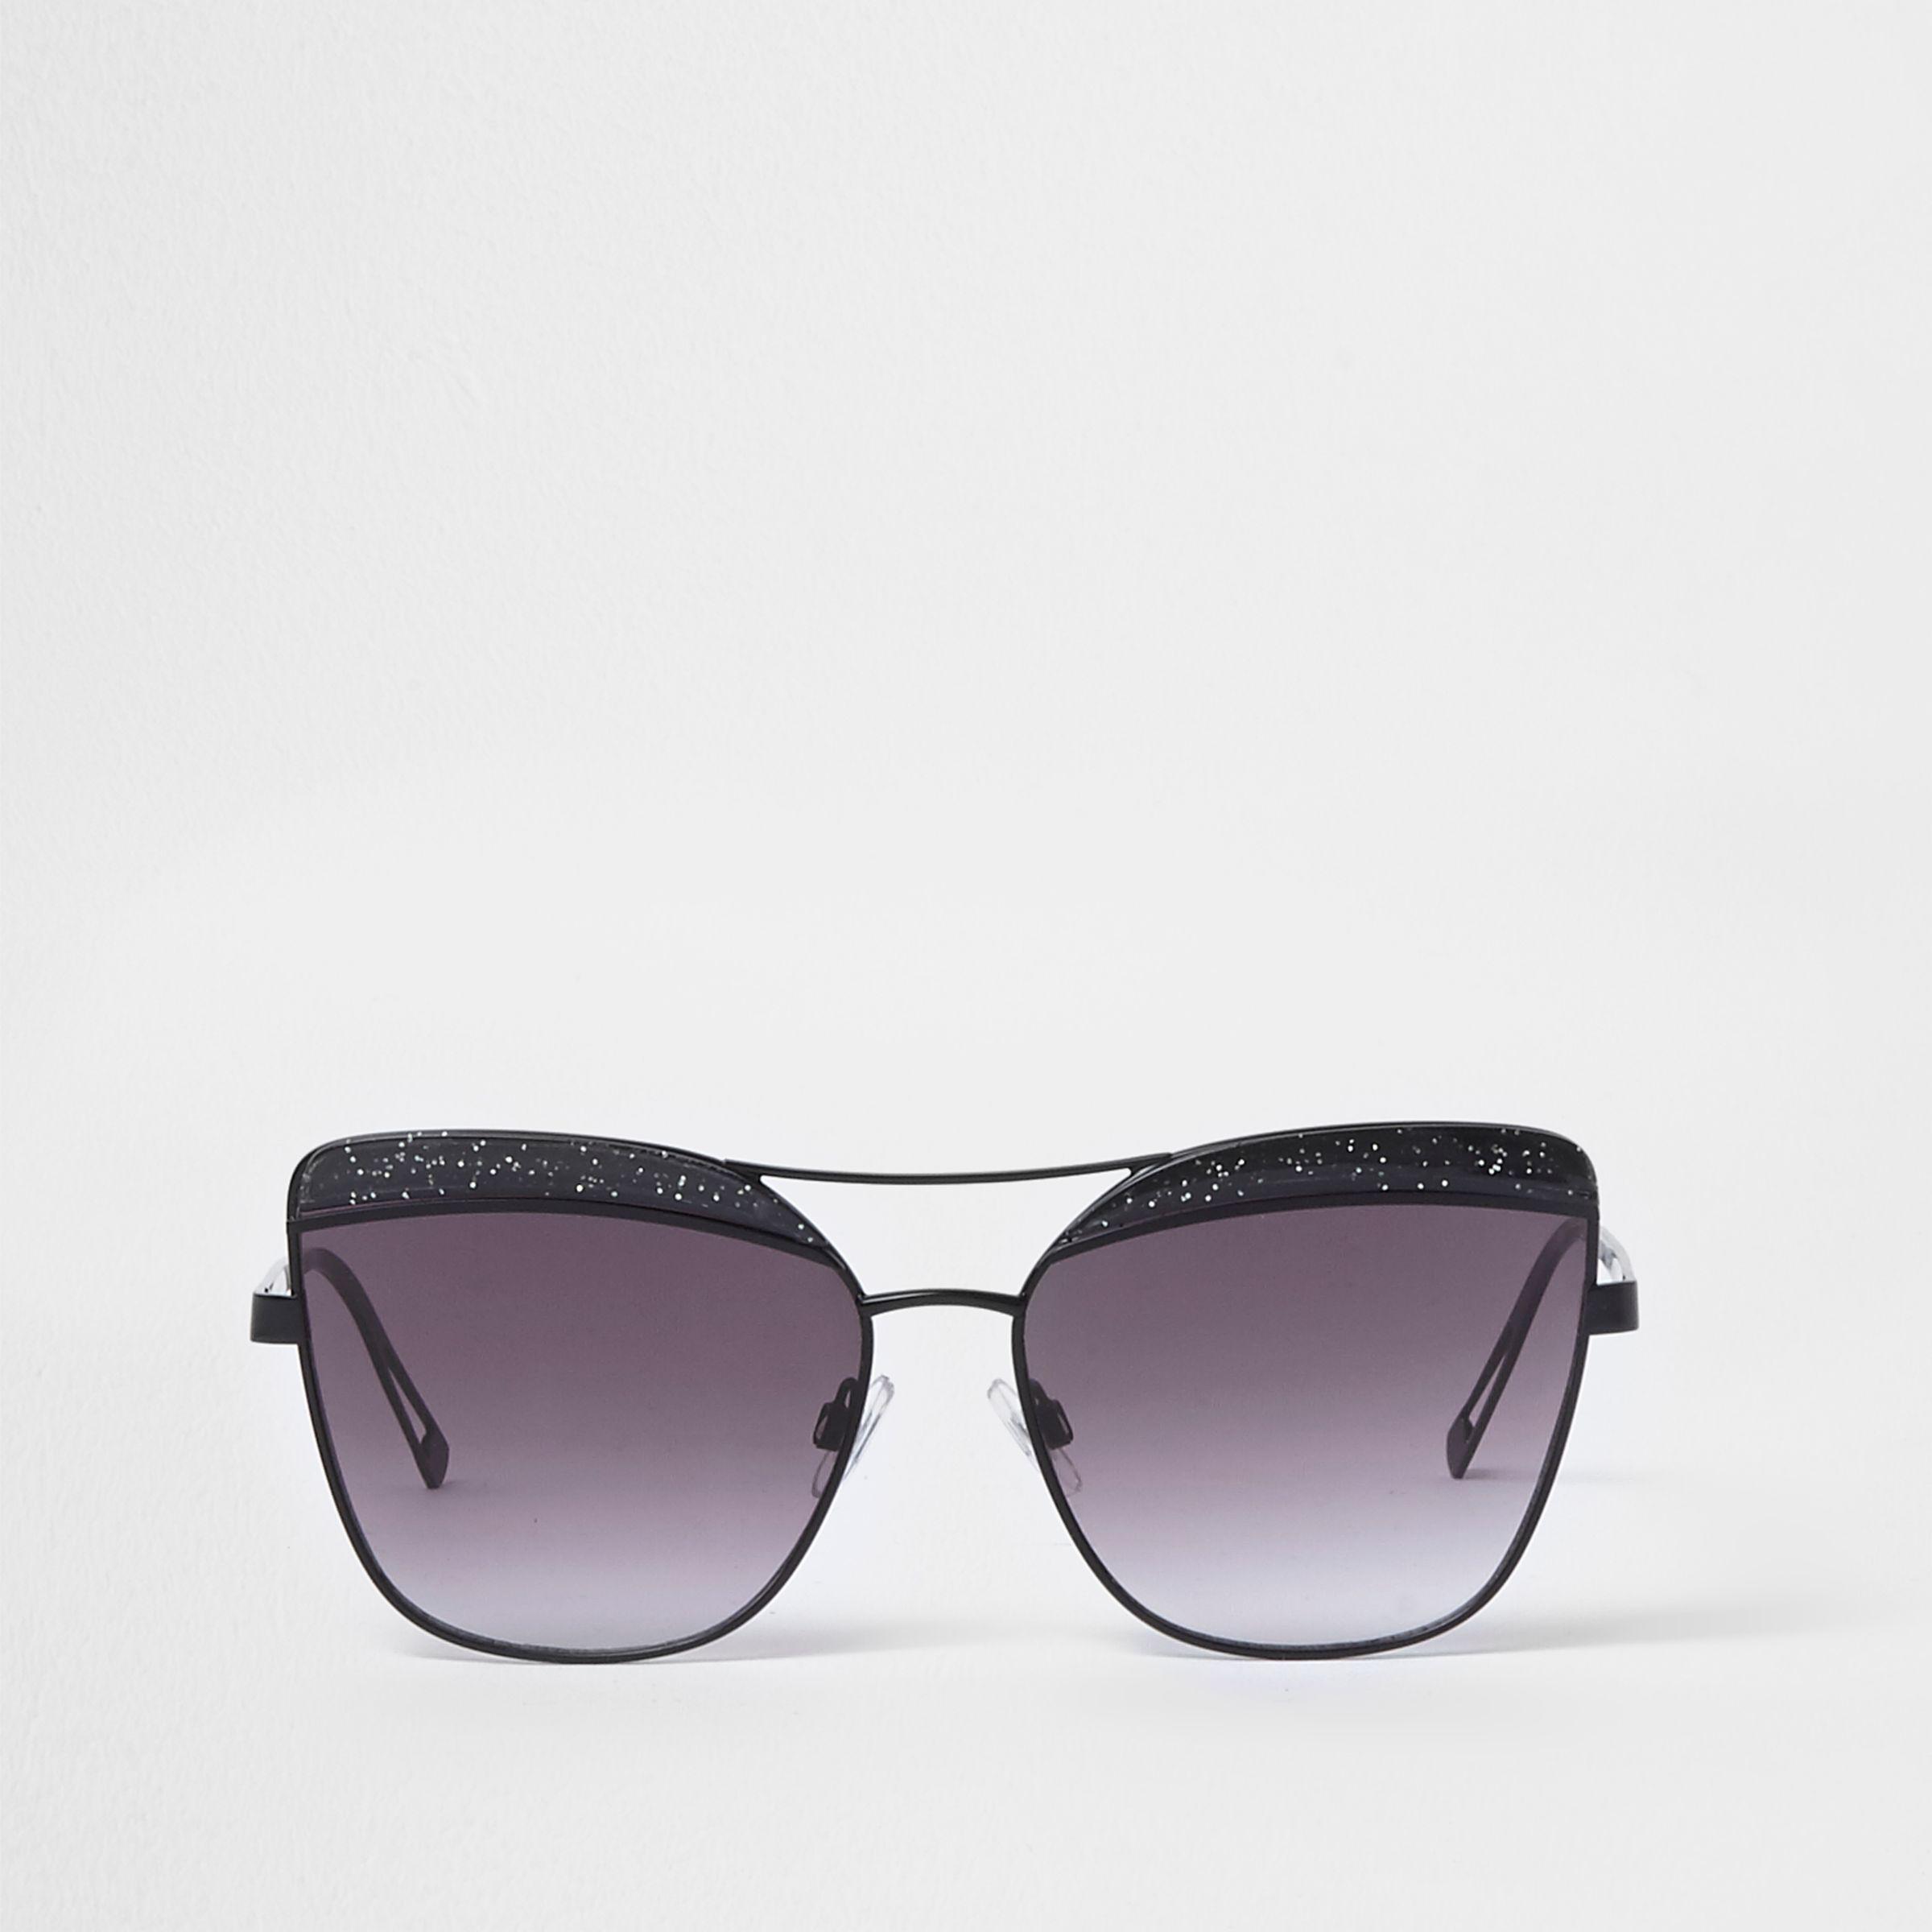 34f0dac0e74 Lyst - River Island Black Glitter Cat Eye Smoke Lens Sunglasses in Black